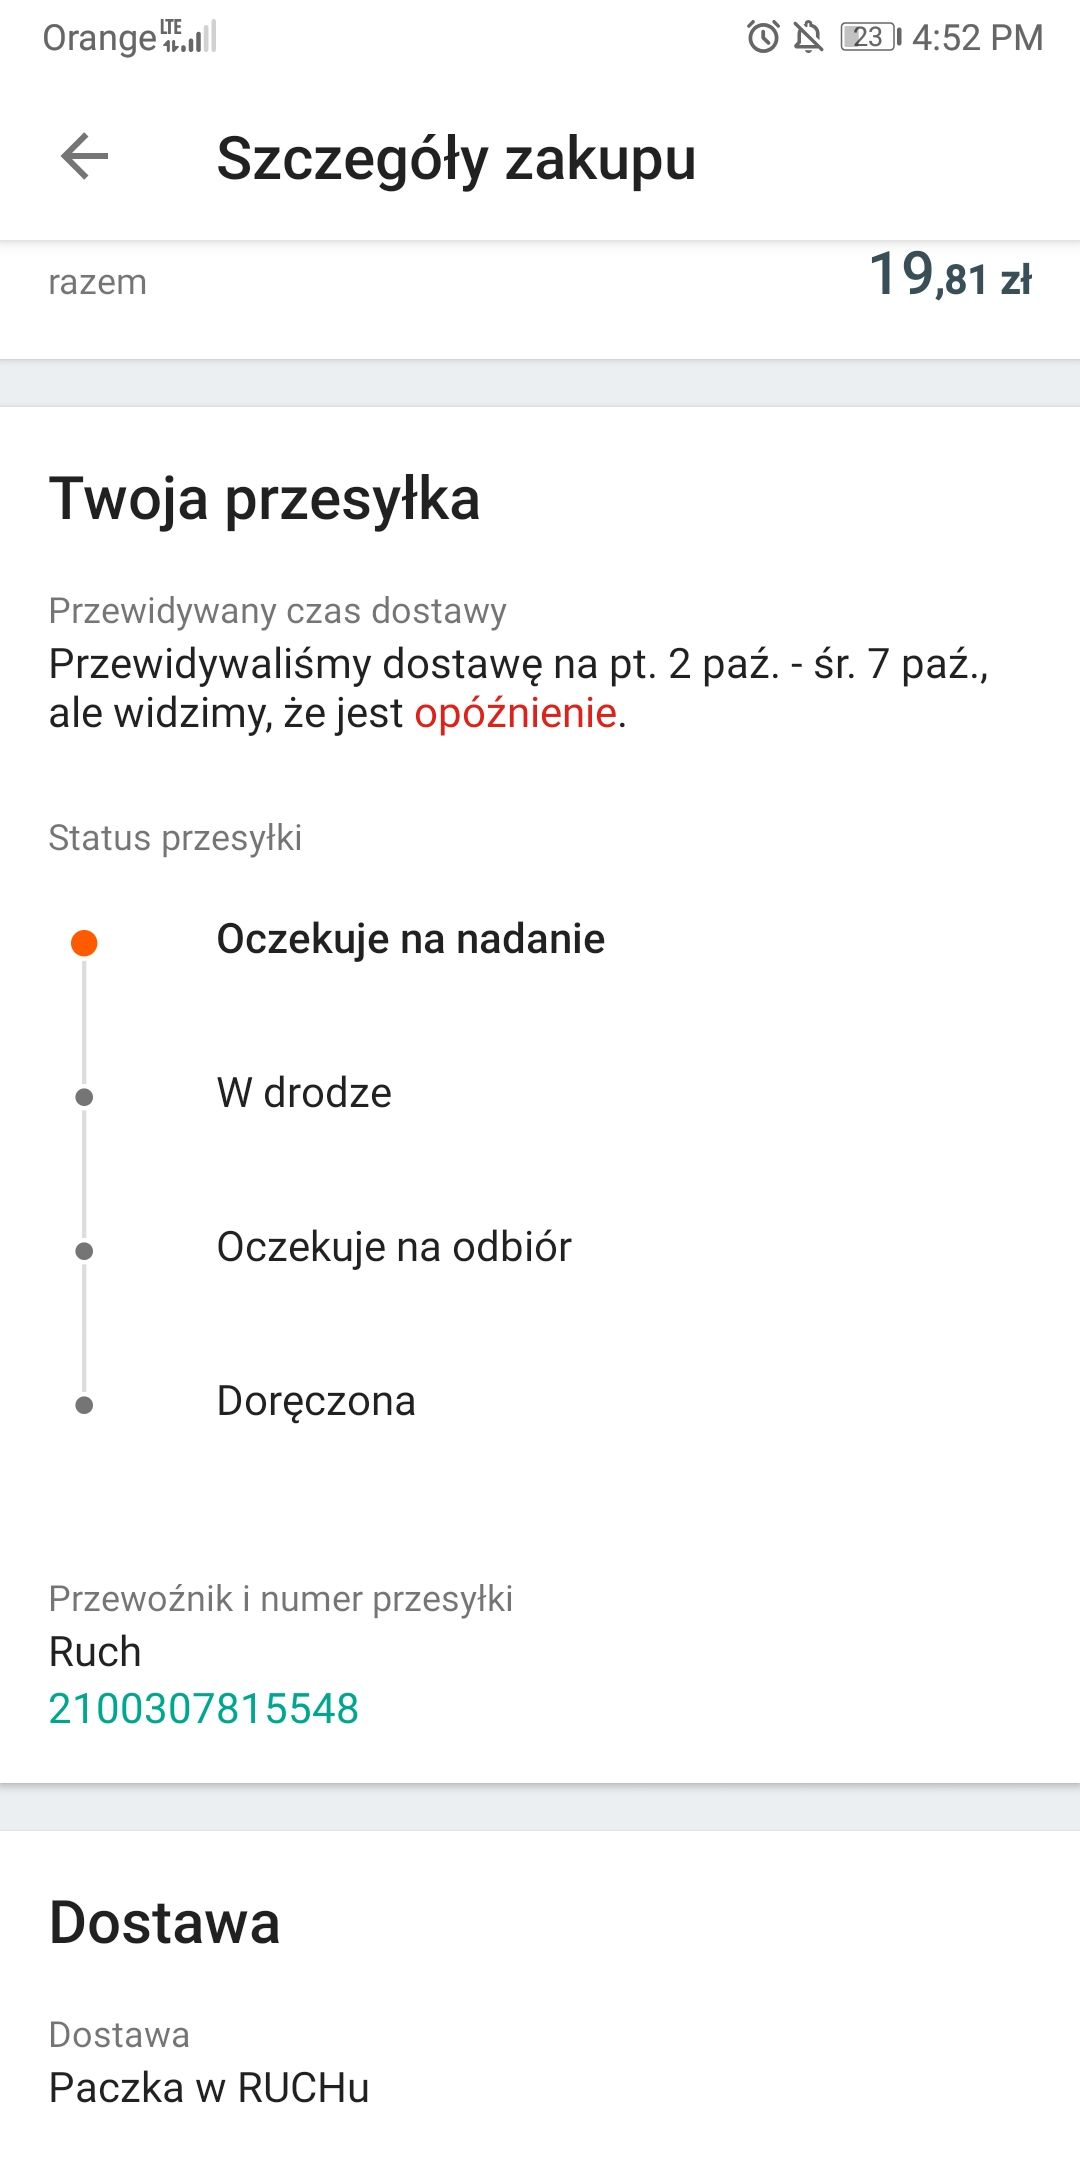 Nieodebrana Paczka W Ruchu Bledny Status Allegro Spolecznosc Allegro 101601